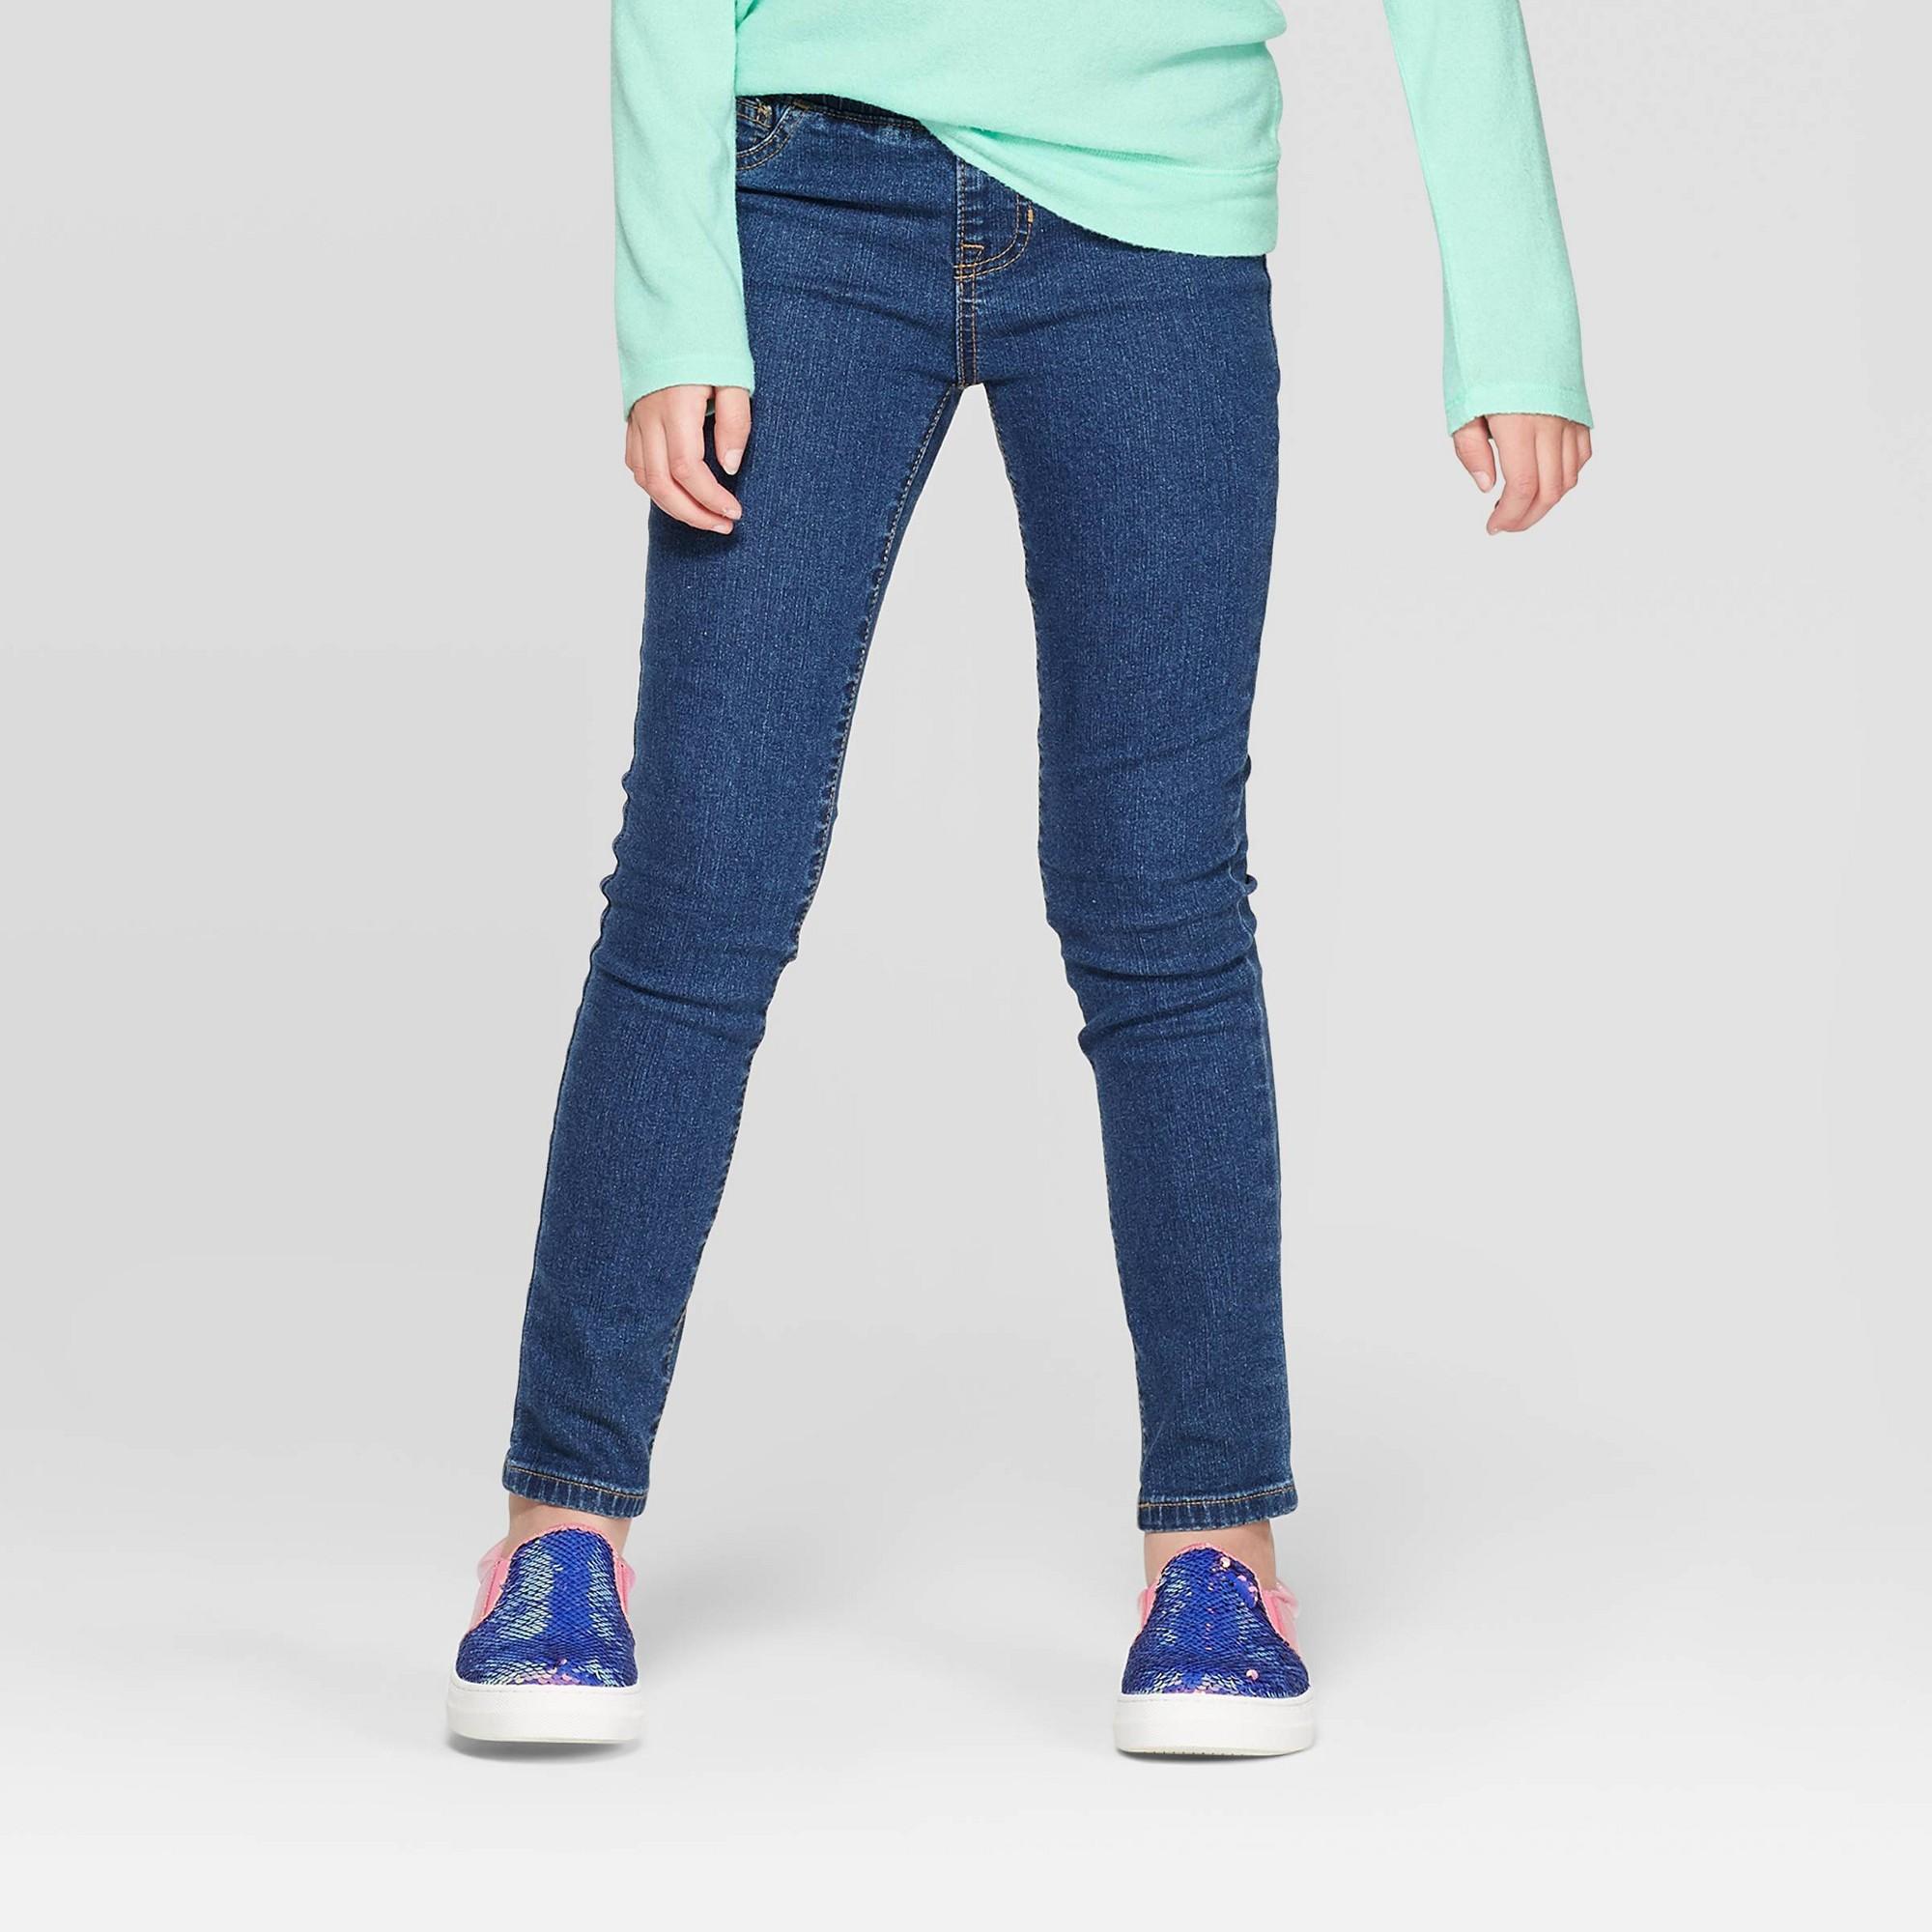 Plus Size Girls' Pull-On Skinny Jeans - Cat & Jack Medium Wash 10 Plus, Blue